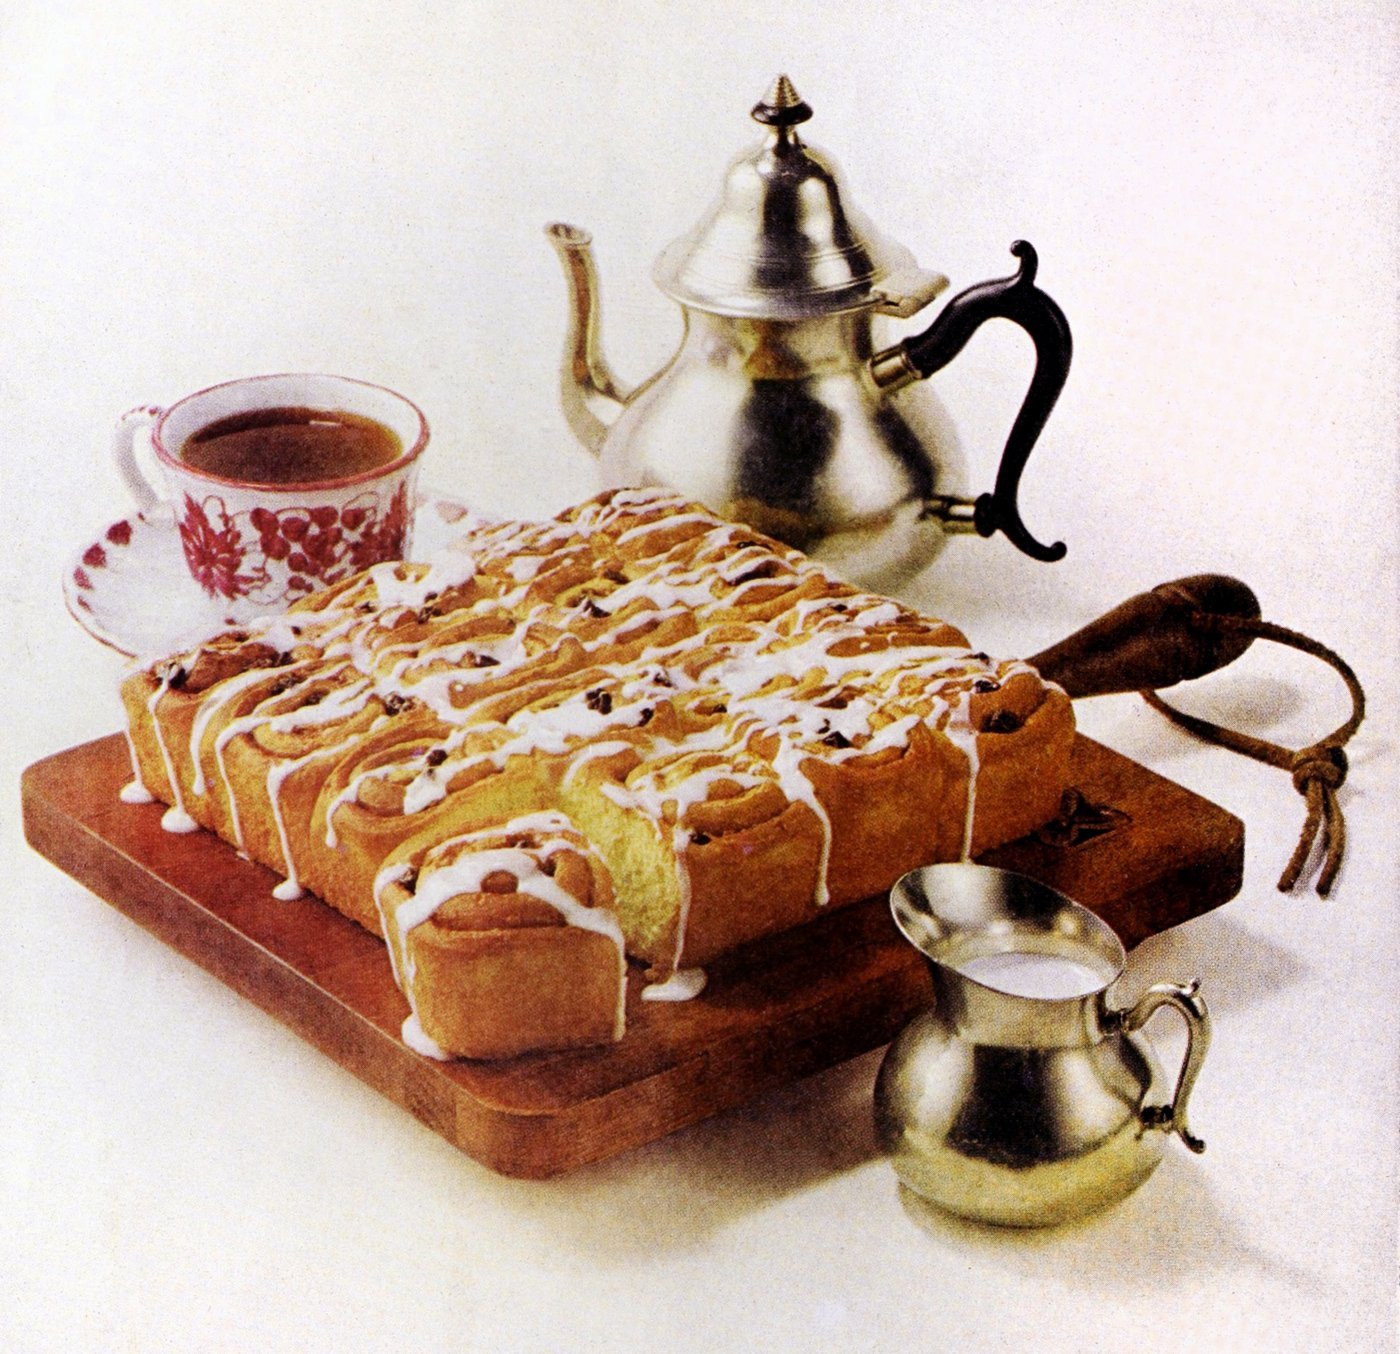 Raisin-cinnamon rolls - Vintage recipe